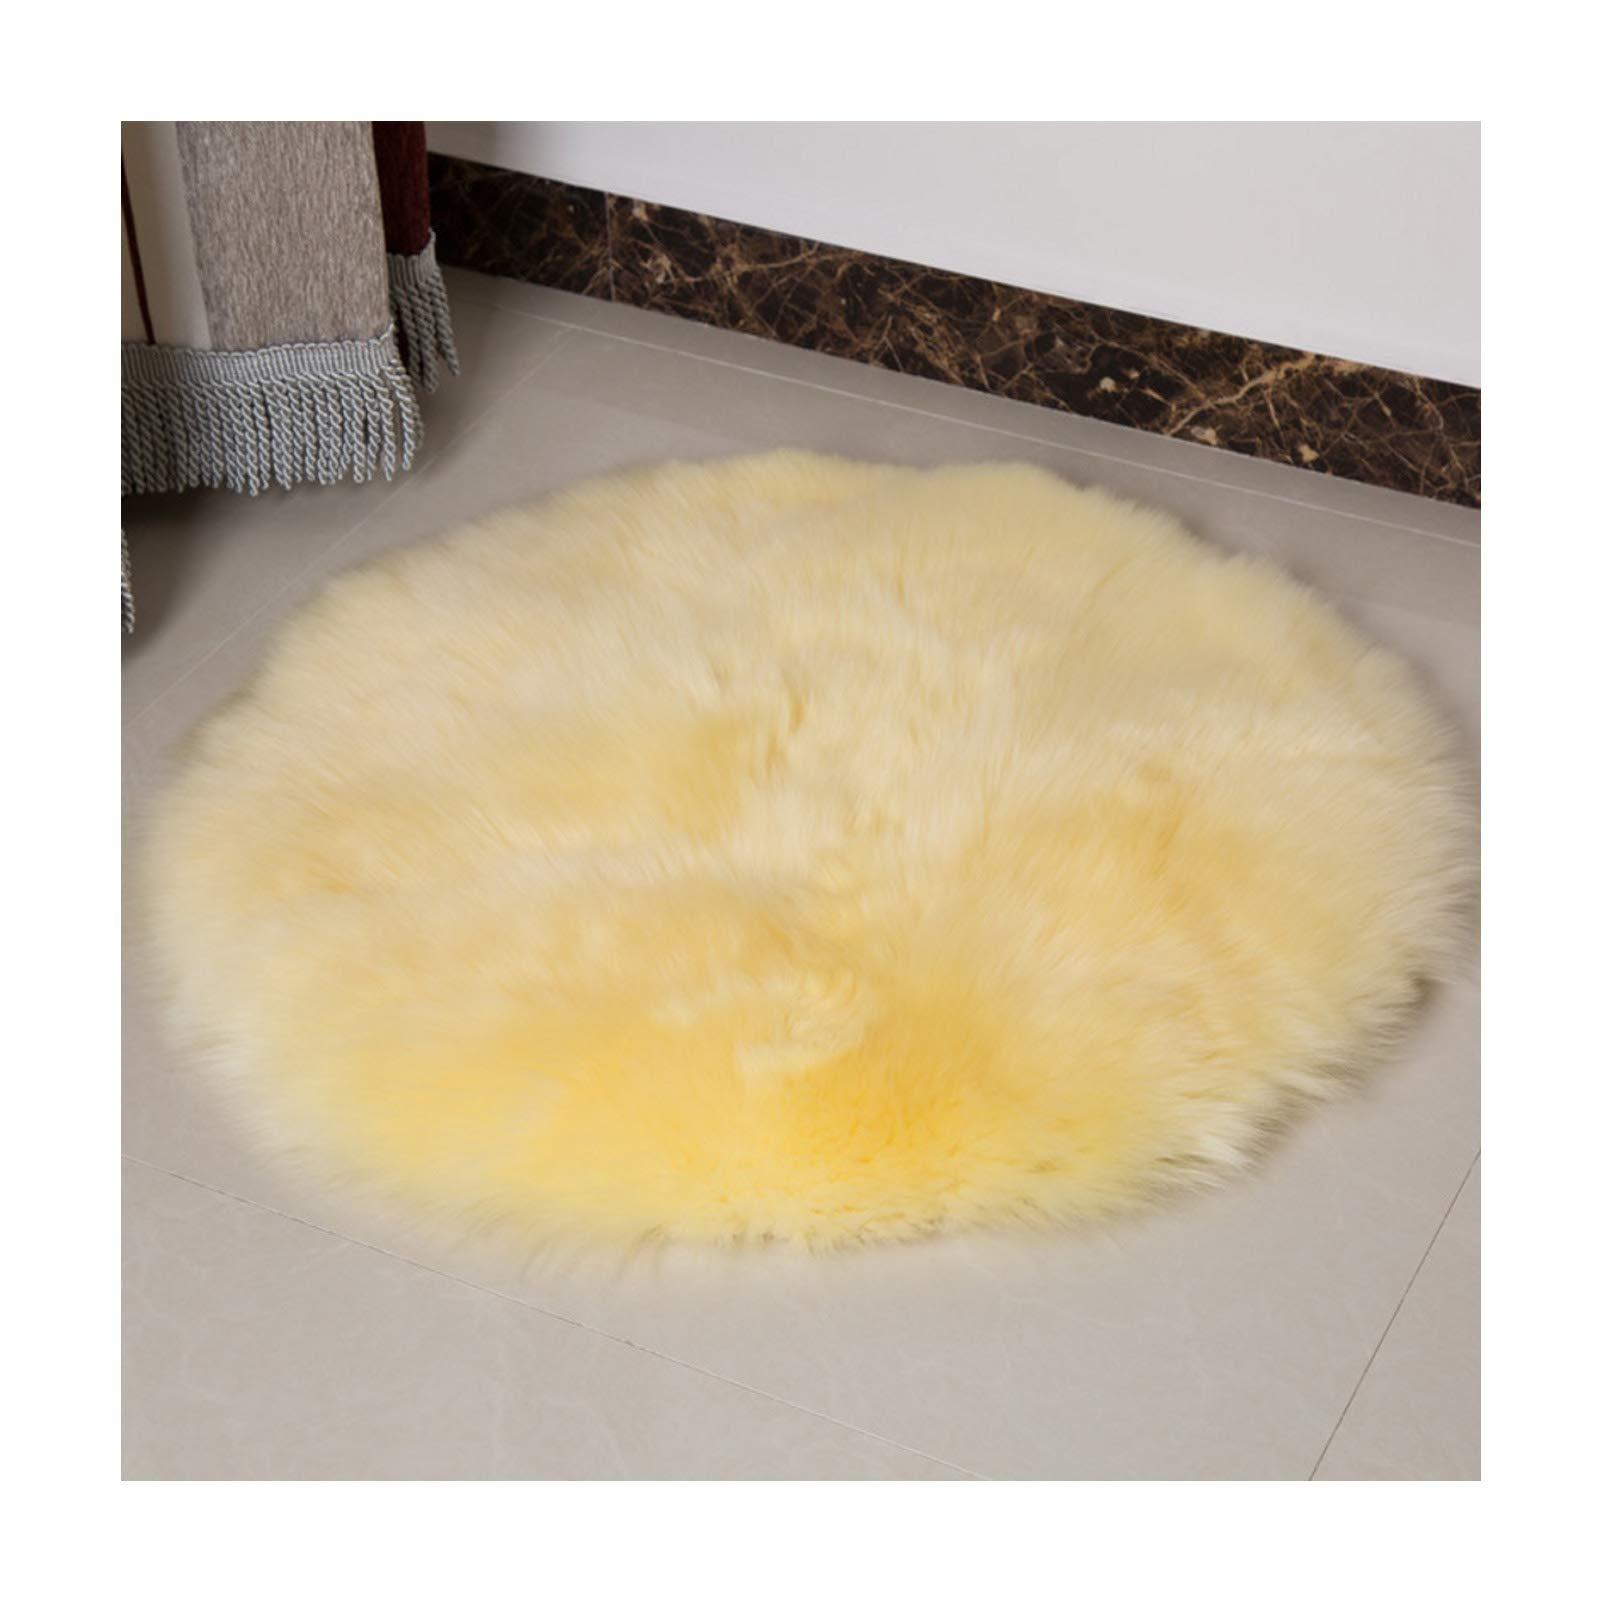 Elhouse Round Mat Home Decor Faux Fur Sheepskin Rugs Kids Carpet Nursery Bedroom Fluffy Rug Shaggy Area Rug, Diameter 5ft Light Yellow